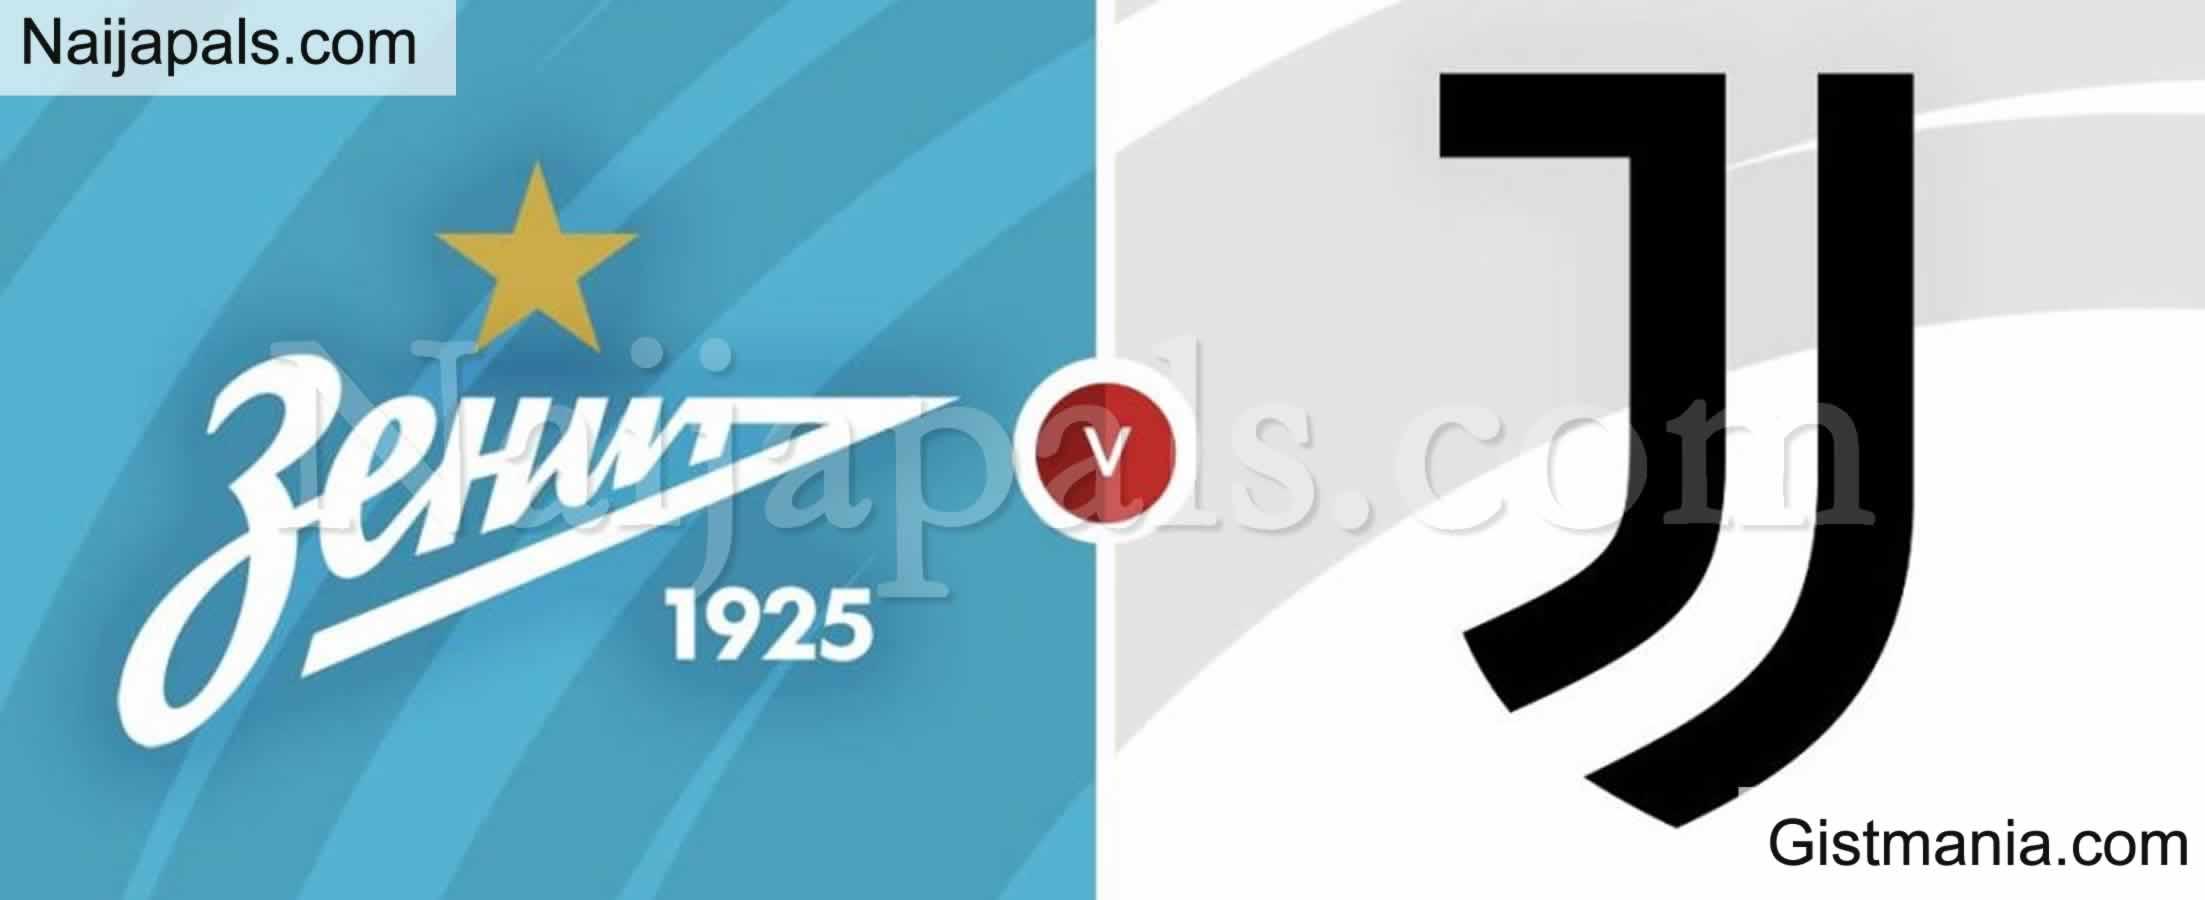 <img alt='.' class='lazyload' data-src='https://img.gistmania.com/emot/soccer.gif' /> <b>Zenit St.Petersburg v Juventus: UEFA Champion's League Match, Team News, Goal Scorers and Stats</b>